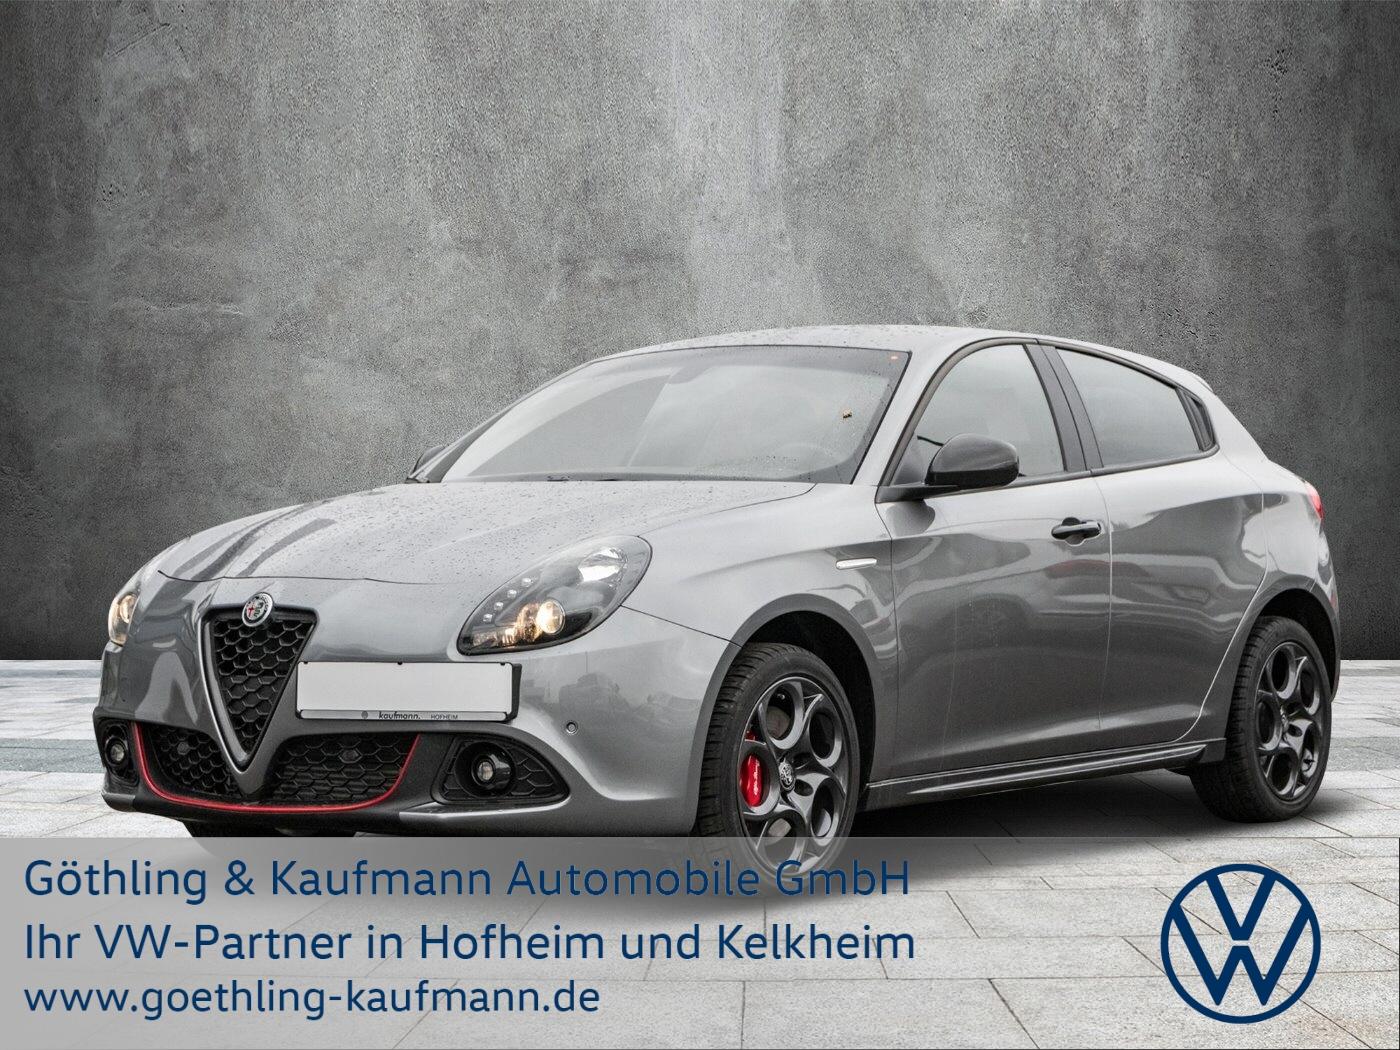 Alfa Romeo Giulietta 1.4 TB 16V 88KW*Sport*Carbon Optik*Kam, Jahr 2019, Benzin